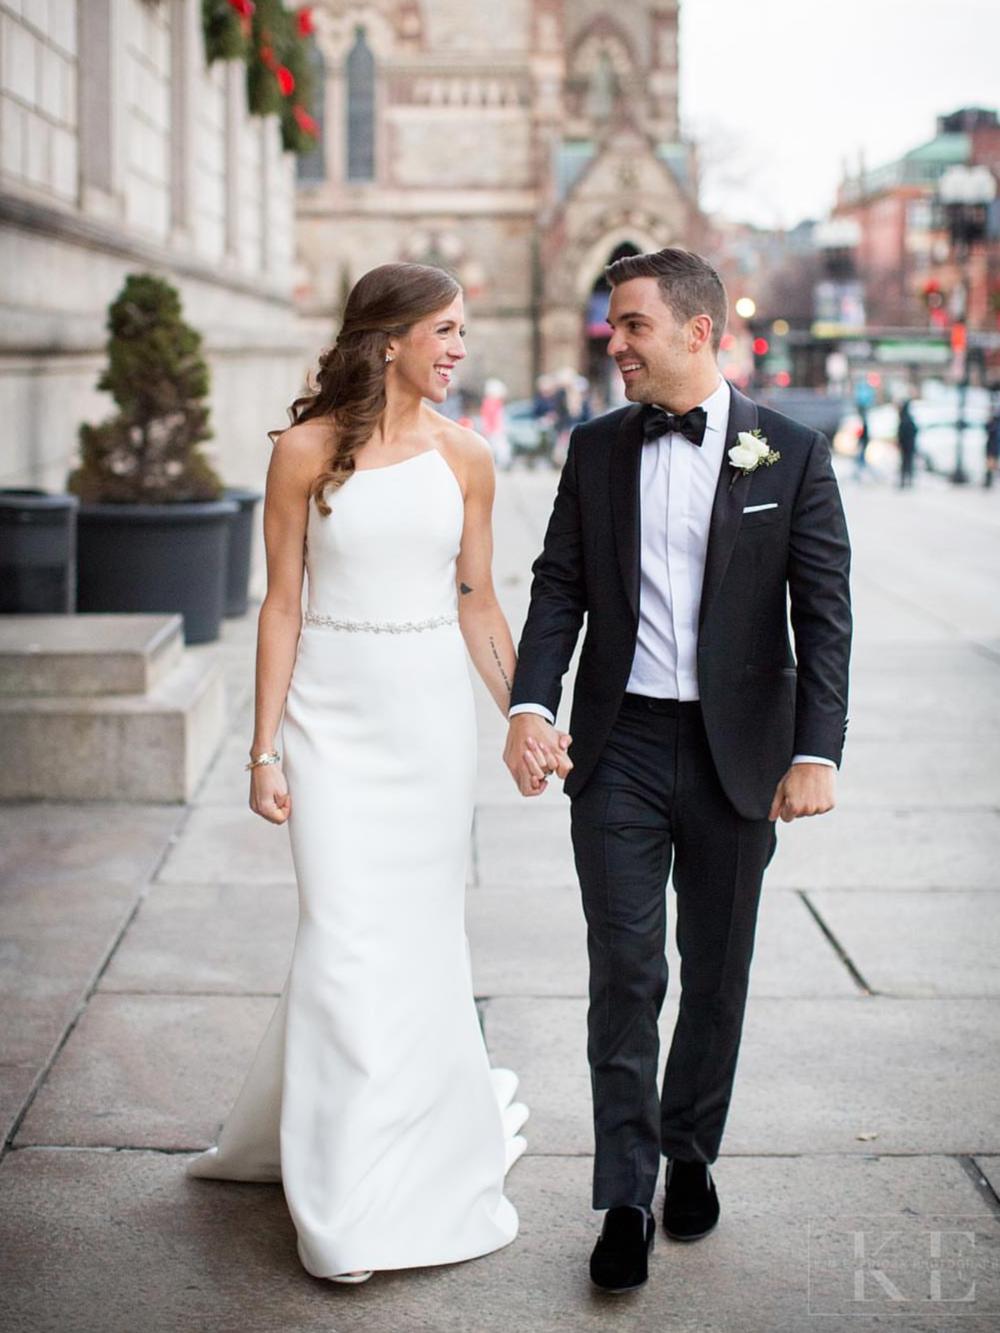 Charlotte & Michael (Boston, MA)